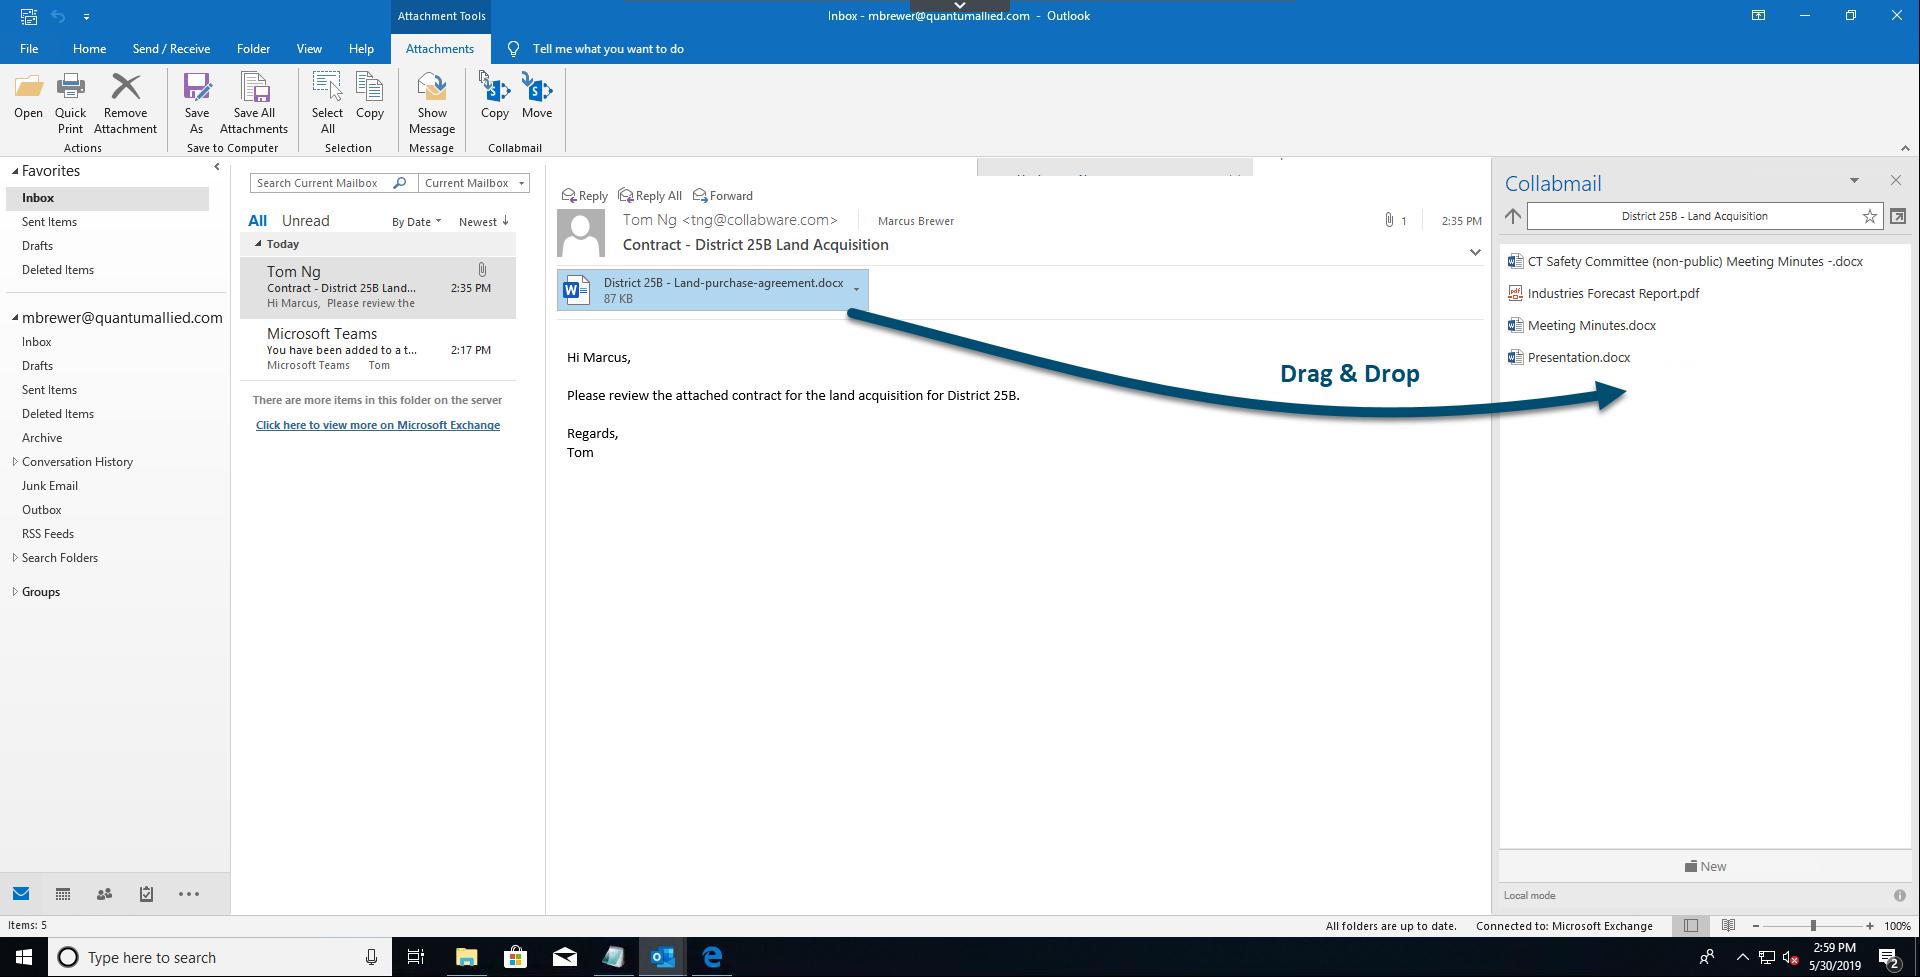 Screenshot of drag and drop from vendor